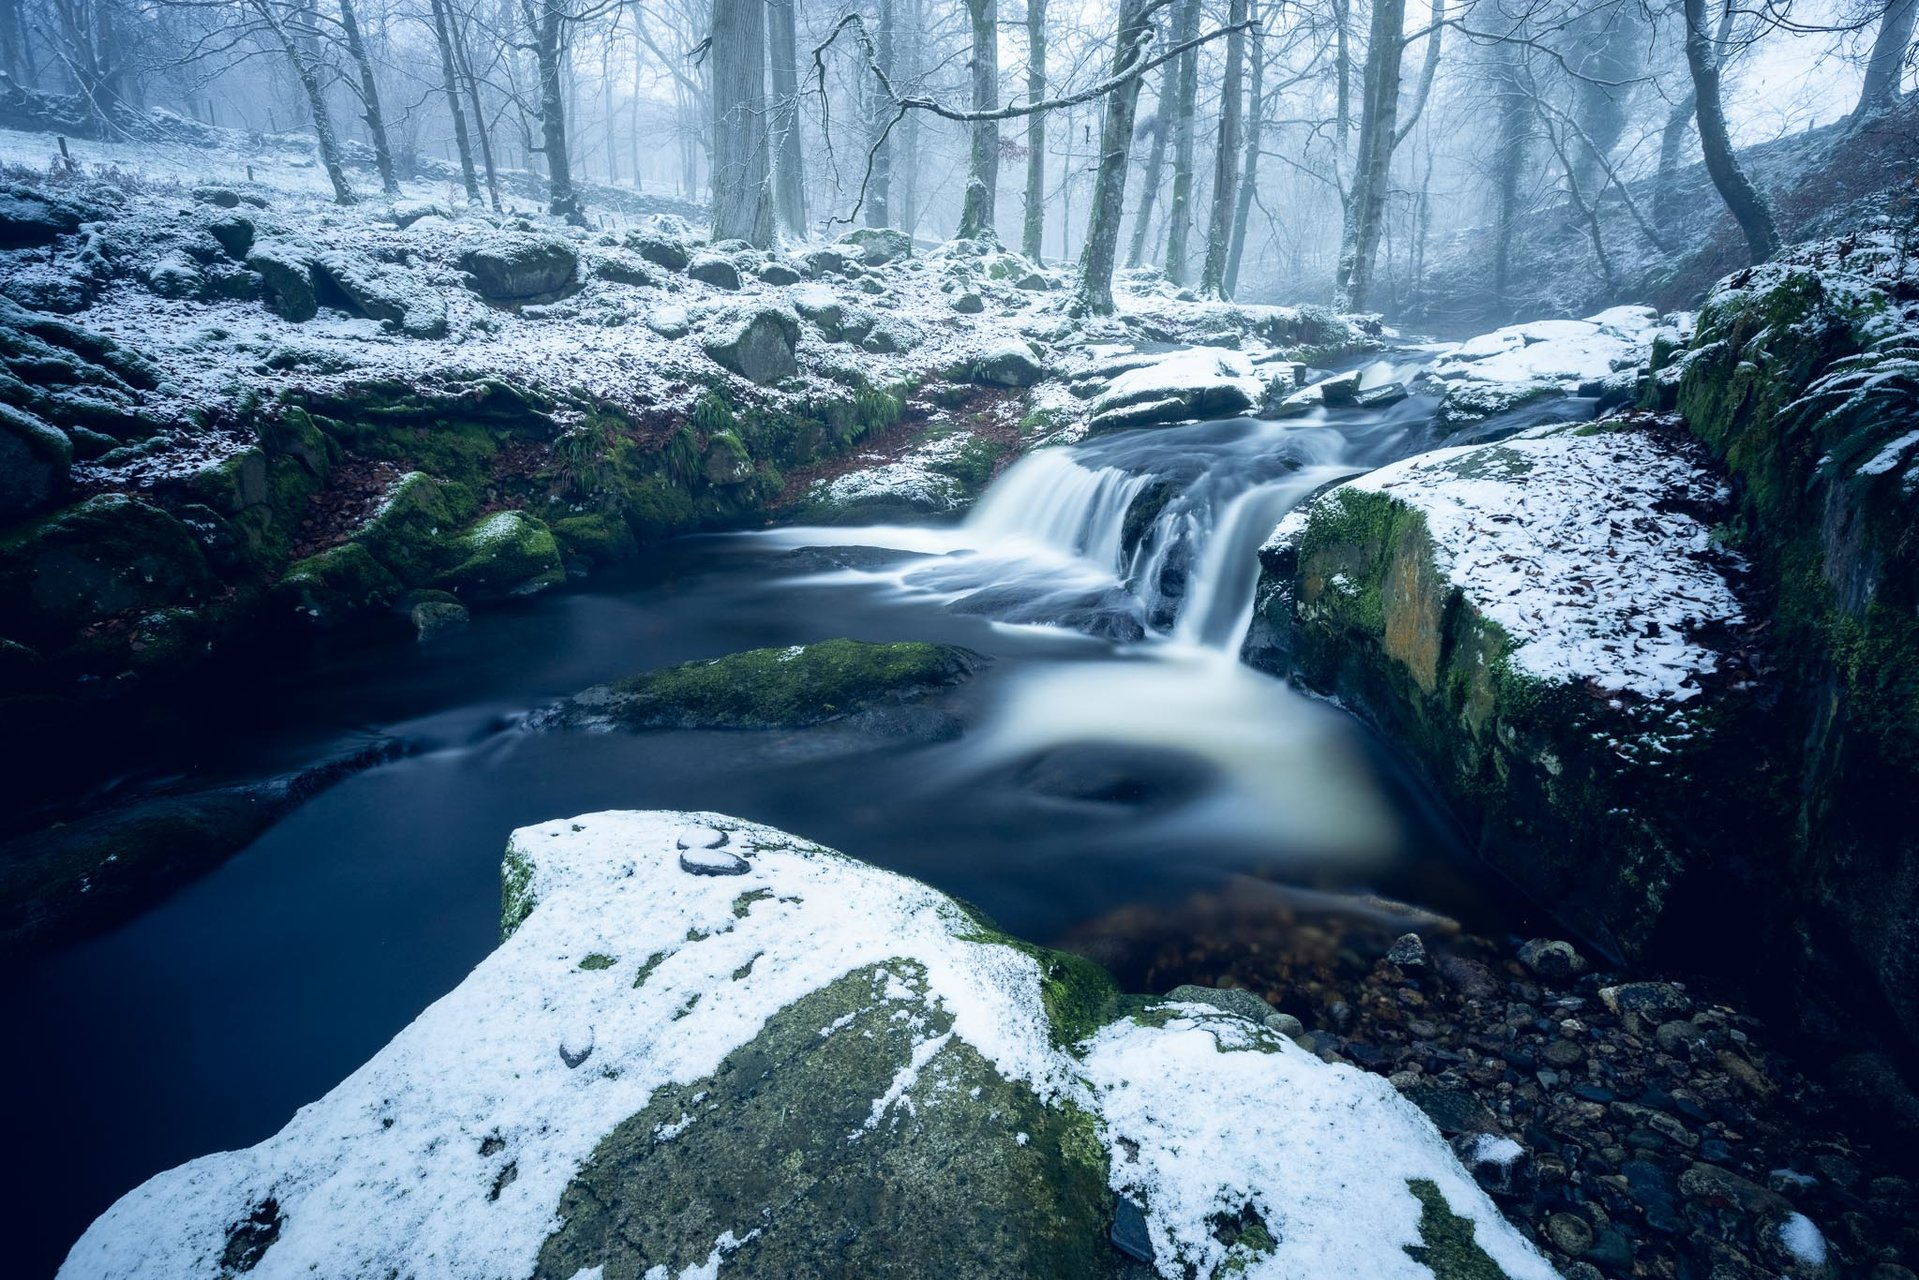 Photo in Nature | Author bayivobg70 | PHOTO FORUM